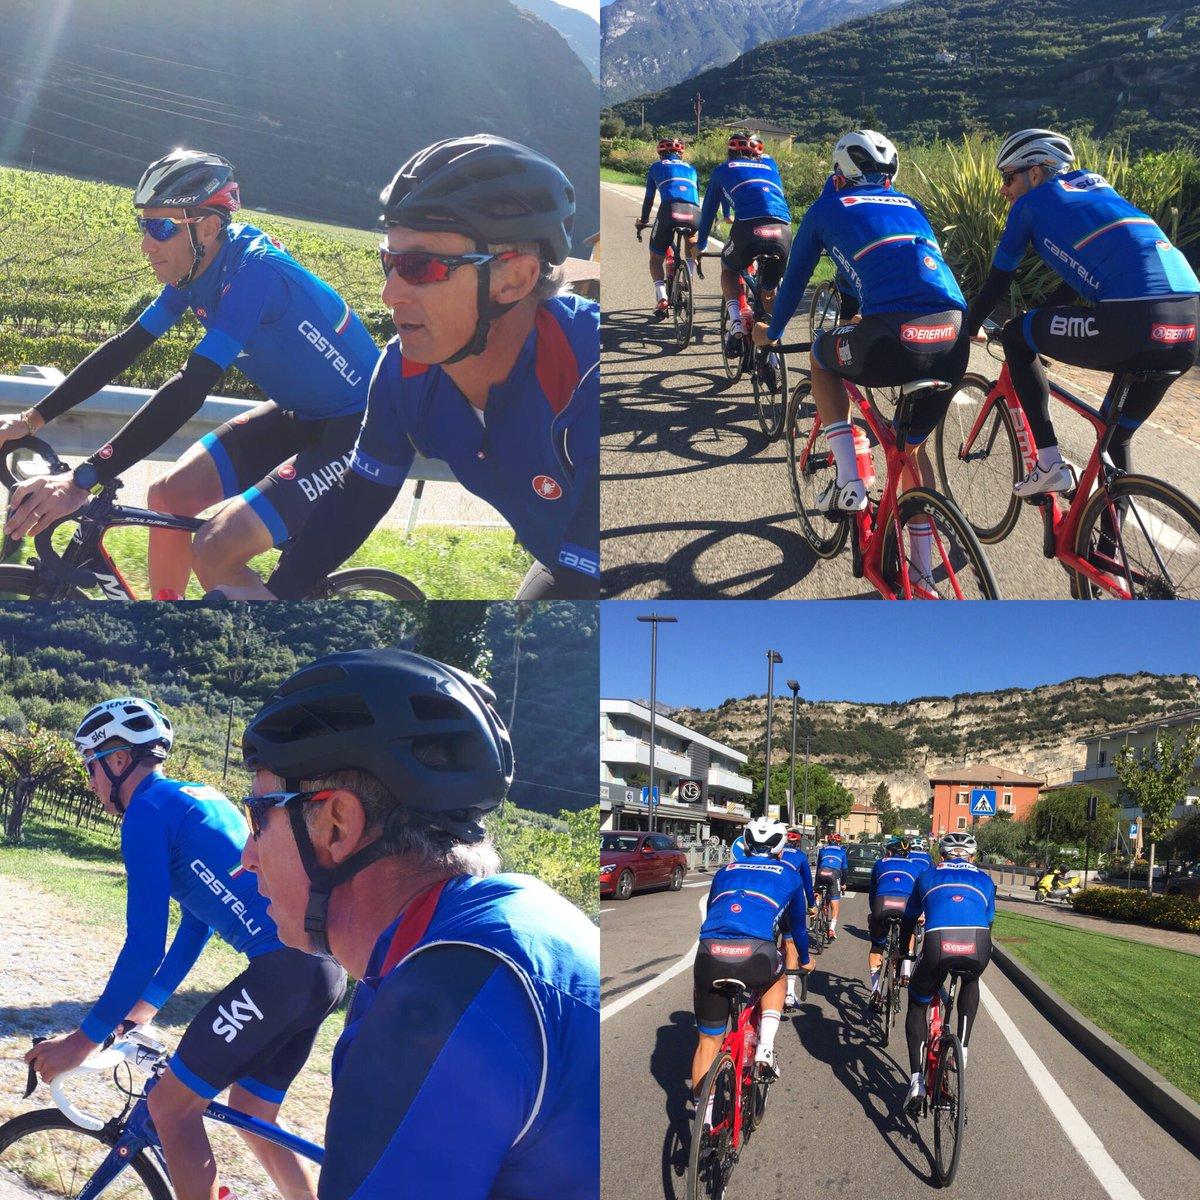 Forza #Italia forza #azzurri forza #campioni #ciclismo @Federciclismo @Gazzetta_it  - Ukustom